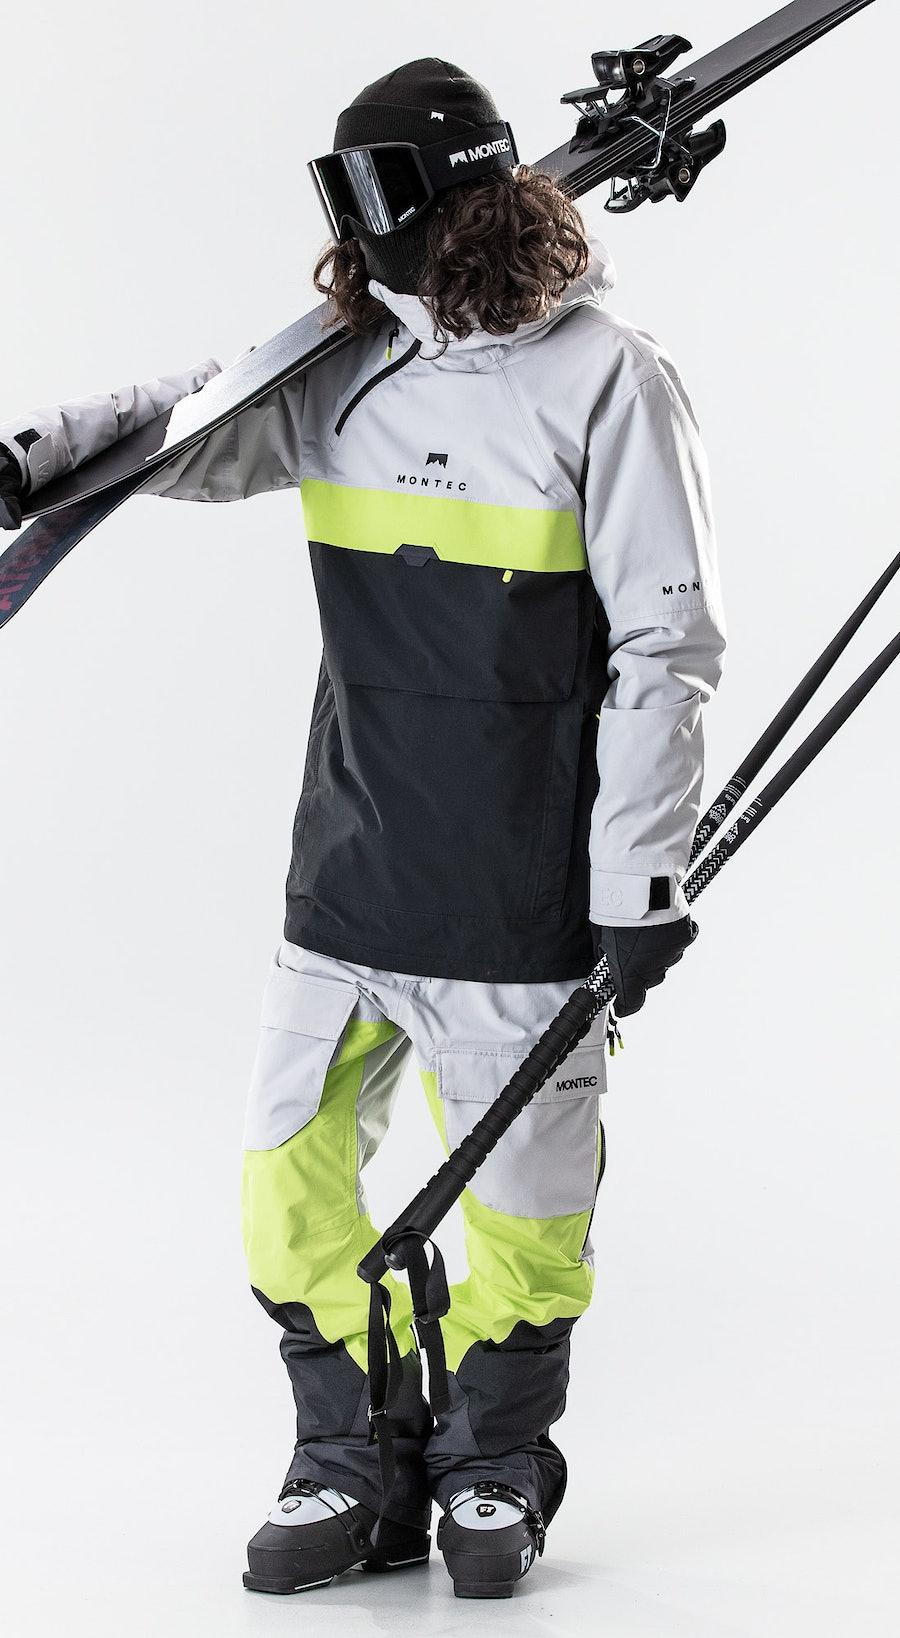 Montec Dune Light Grey/Neon Yellow/Black Outfit Multi